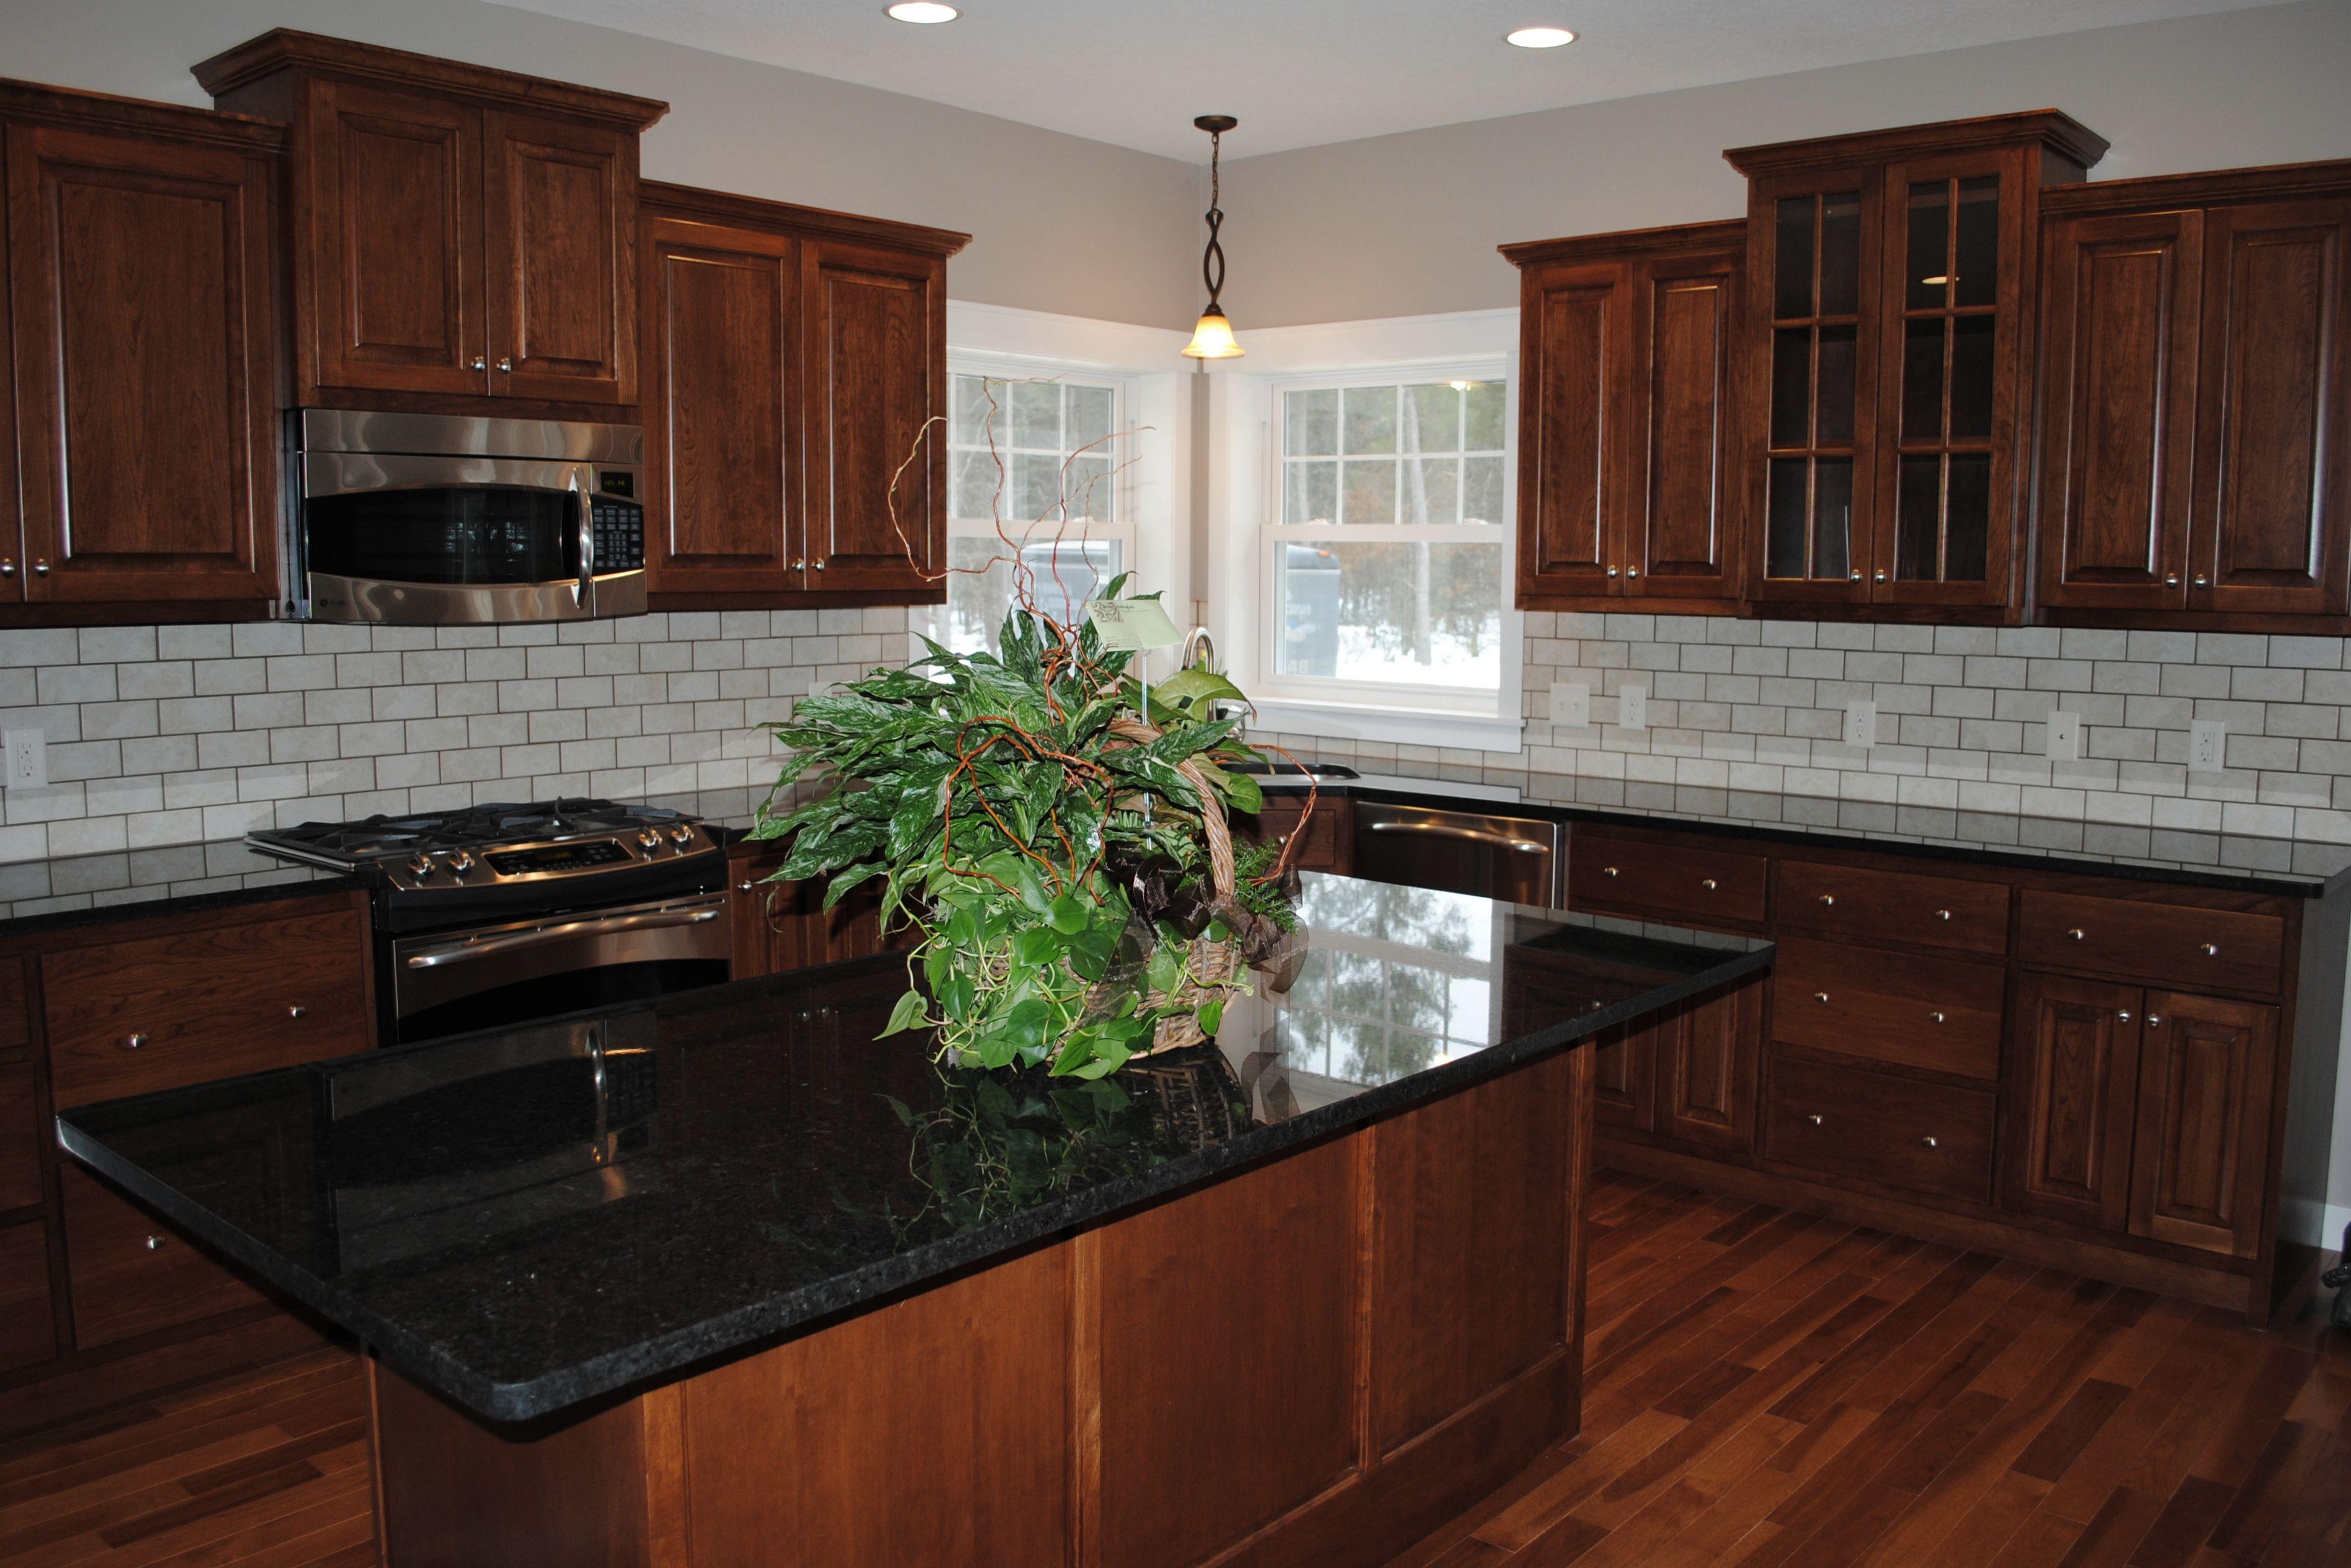 Black Pearl Polished Granite Kitchen Counters | Black ... on Maple Kitchen Cabinets With Black Granite Countertops  id=82636